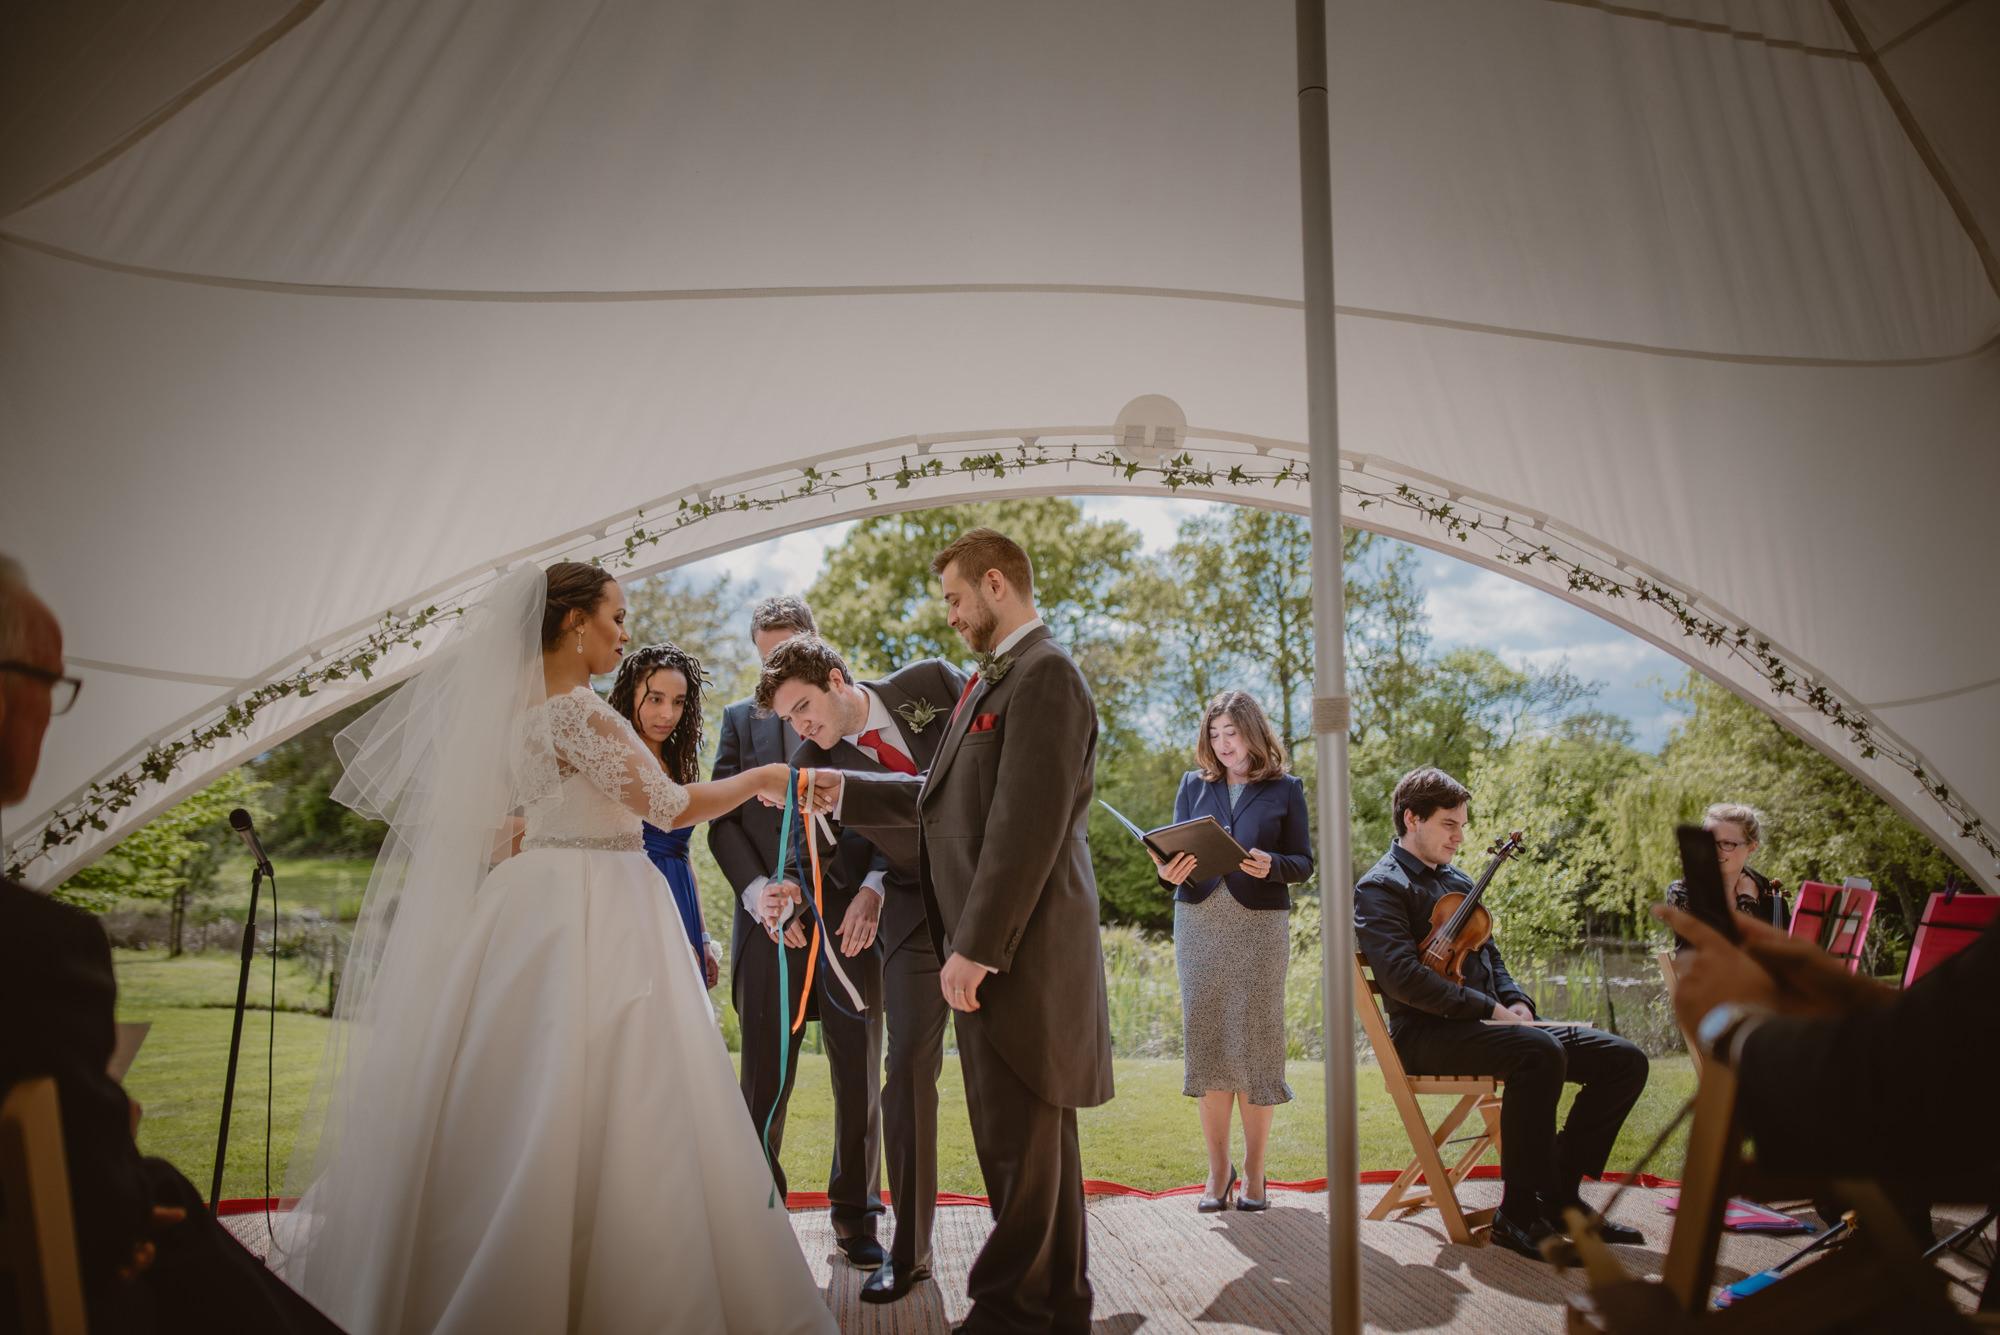 Jacqueline-Gareth-Wedding-Westmead-Events-Surrey-Manu-Mendoza-Wedding-Photography-255.jpg